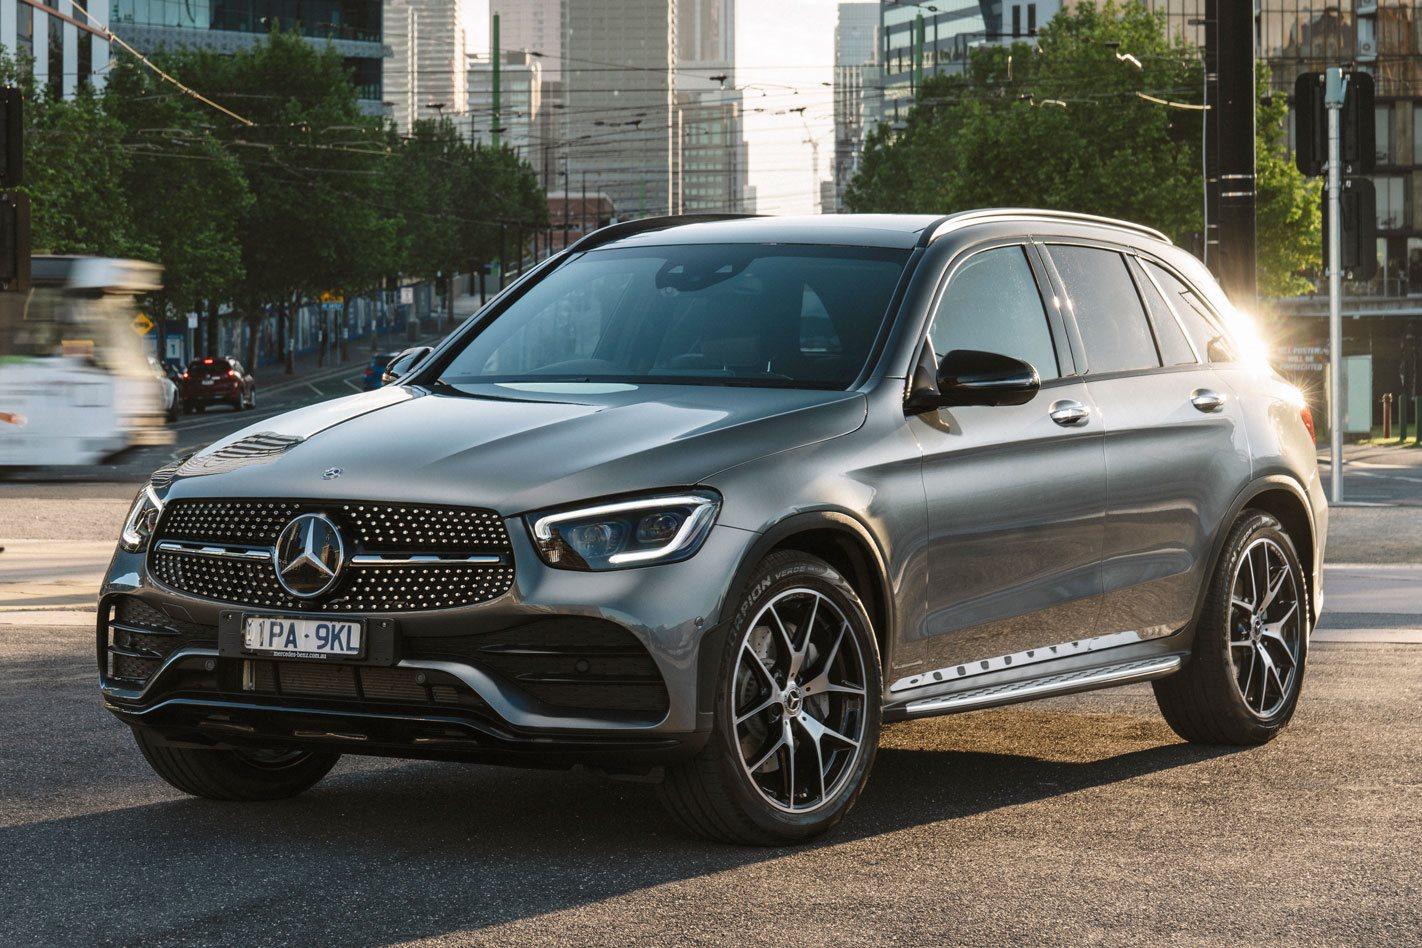 2019 Mercedes-Benz GLC 300 review